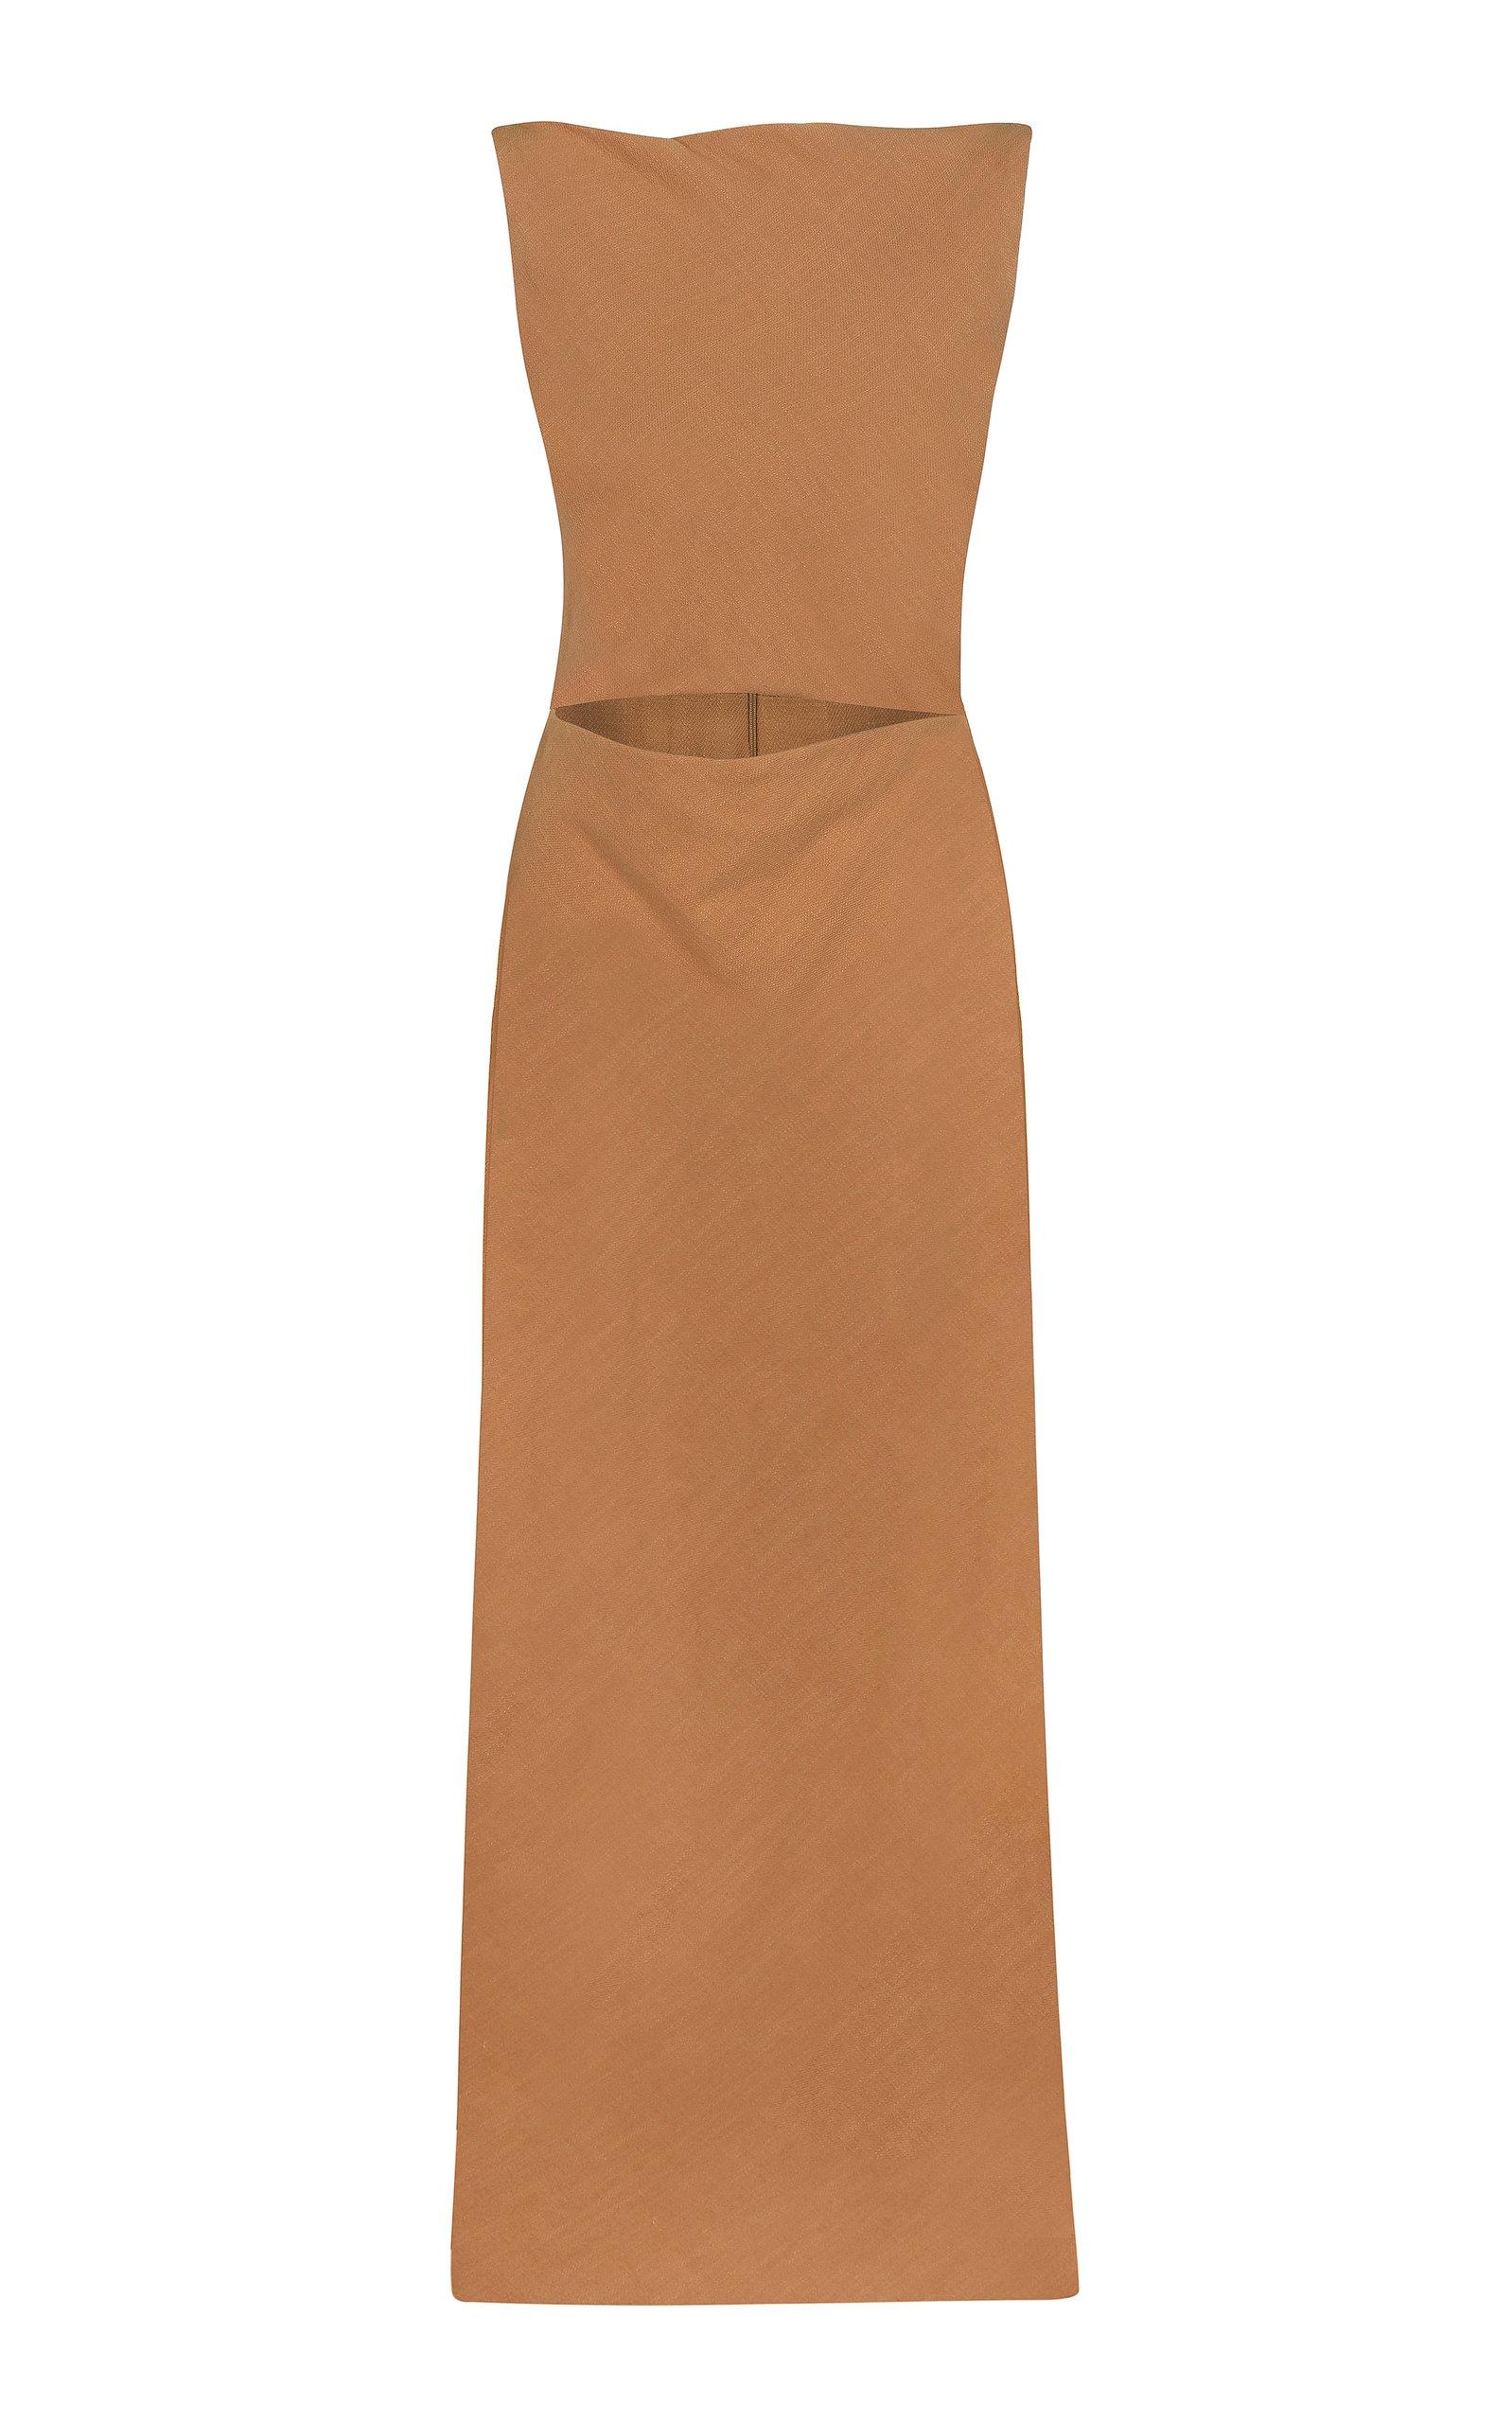 Buy BEVZA Sofia Linen Cutout Dress online, shop BEVZA at the best price